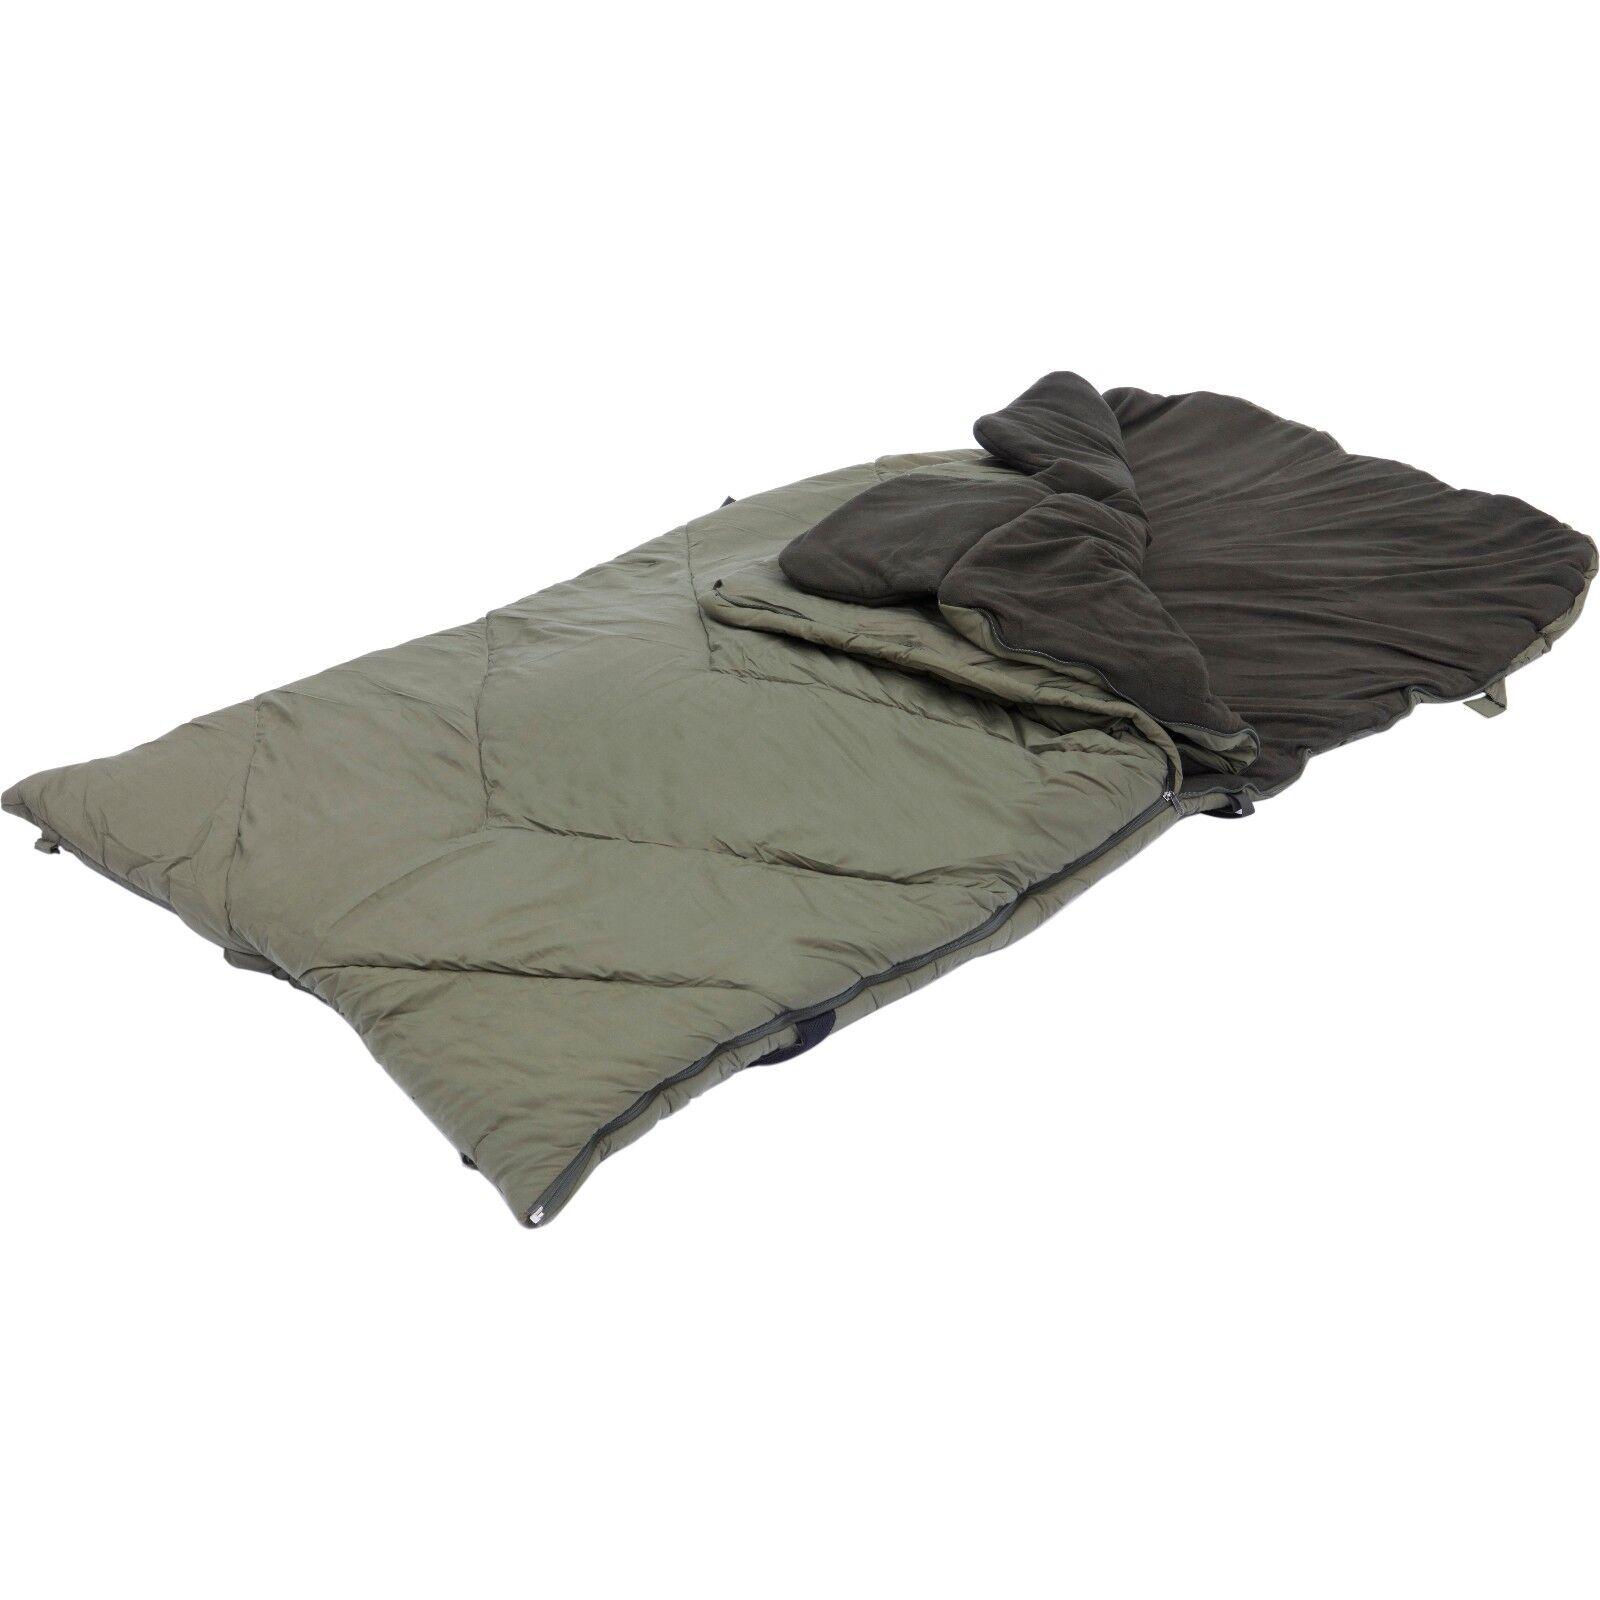 Carp Pro Sleeping Bag Super King Size 5 Season